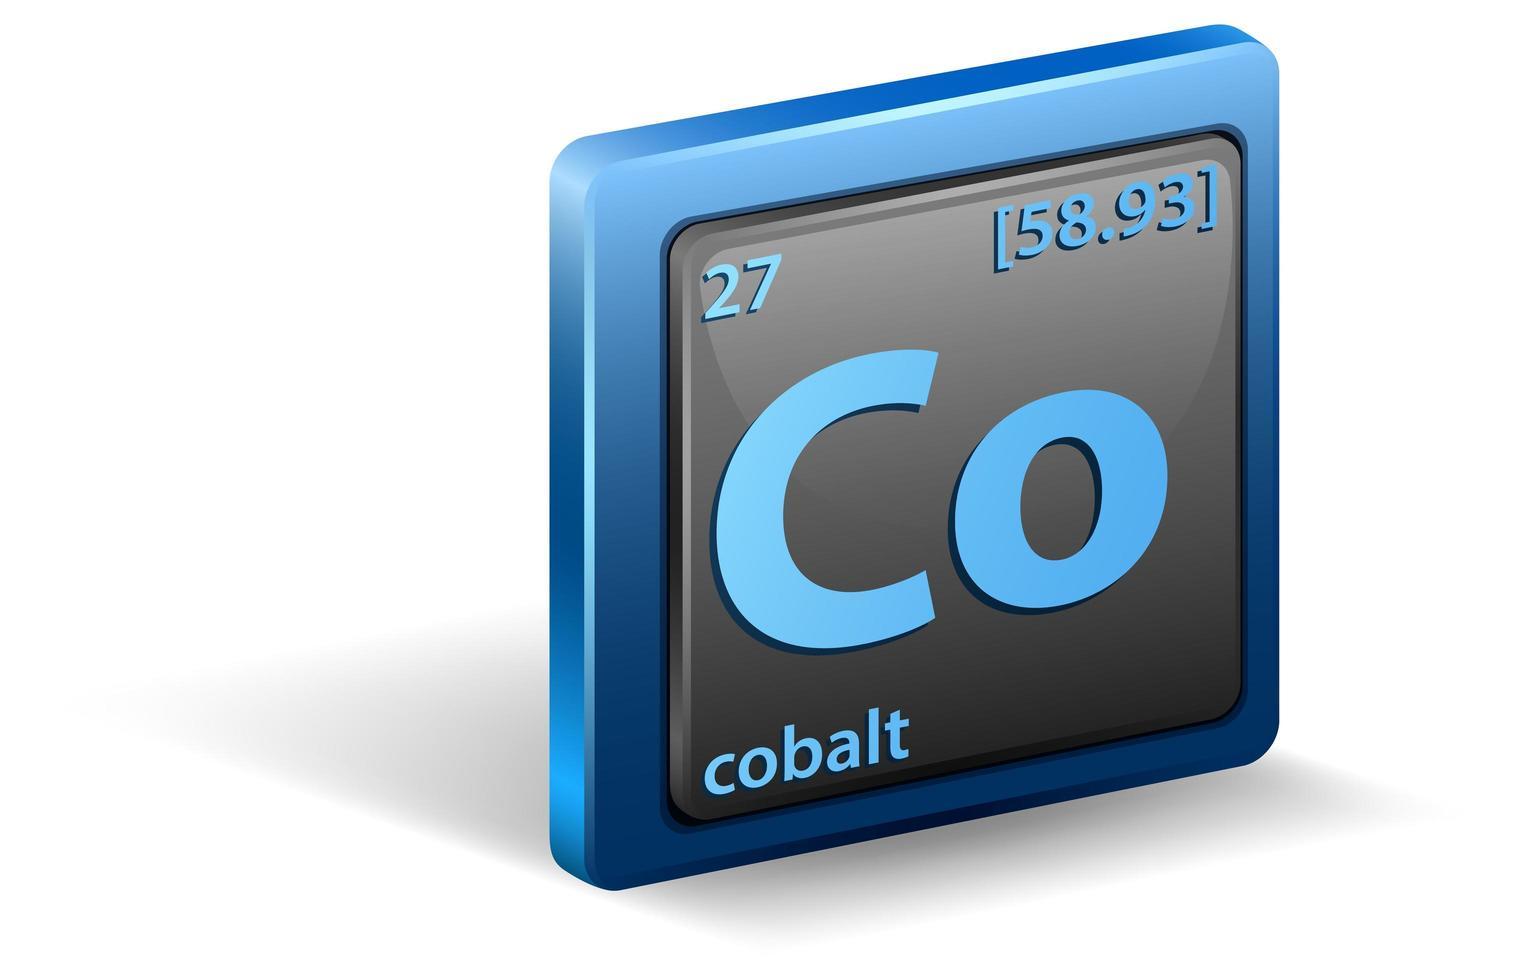 kobalt scheikundig element. chemisch symbool met atoomnummer en atoommassa. vector